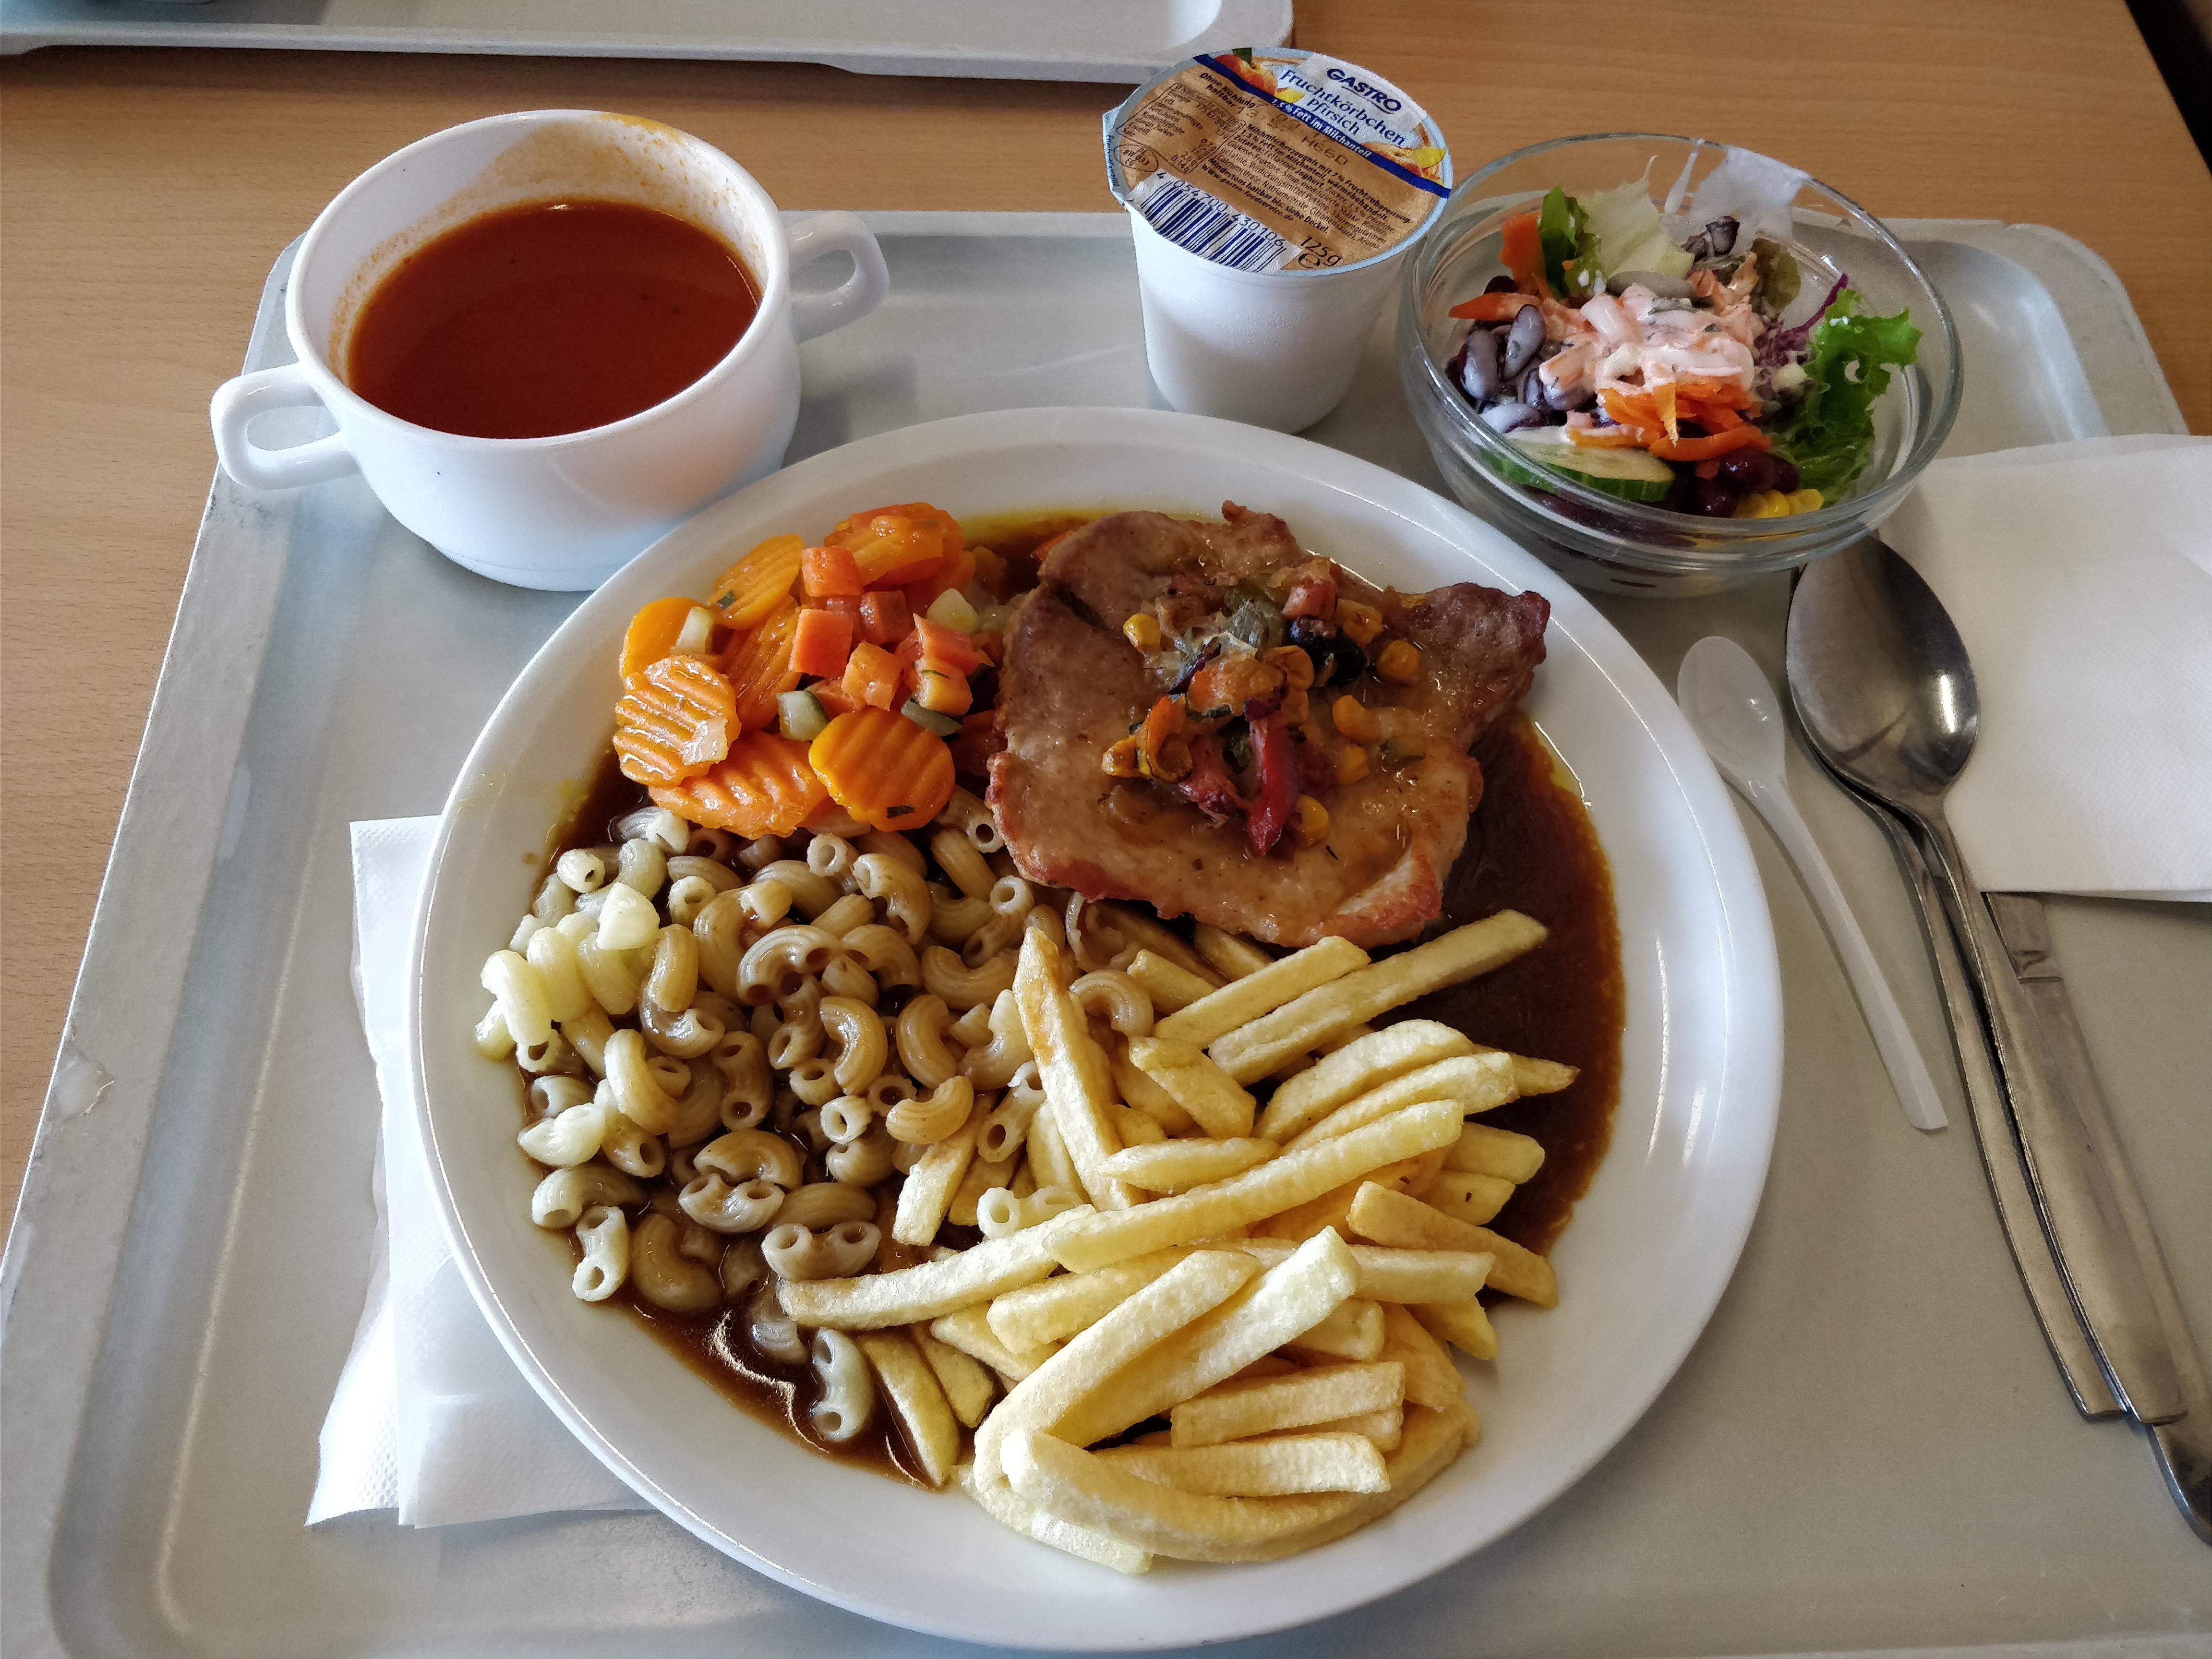 http://foodloader.net/nico_2017-08-01_schweinesteak-nudeln-pommes-gemuese-suppe-salat-joghurt.jpg